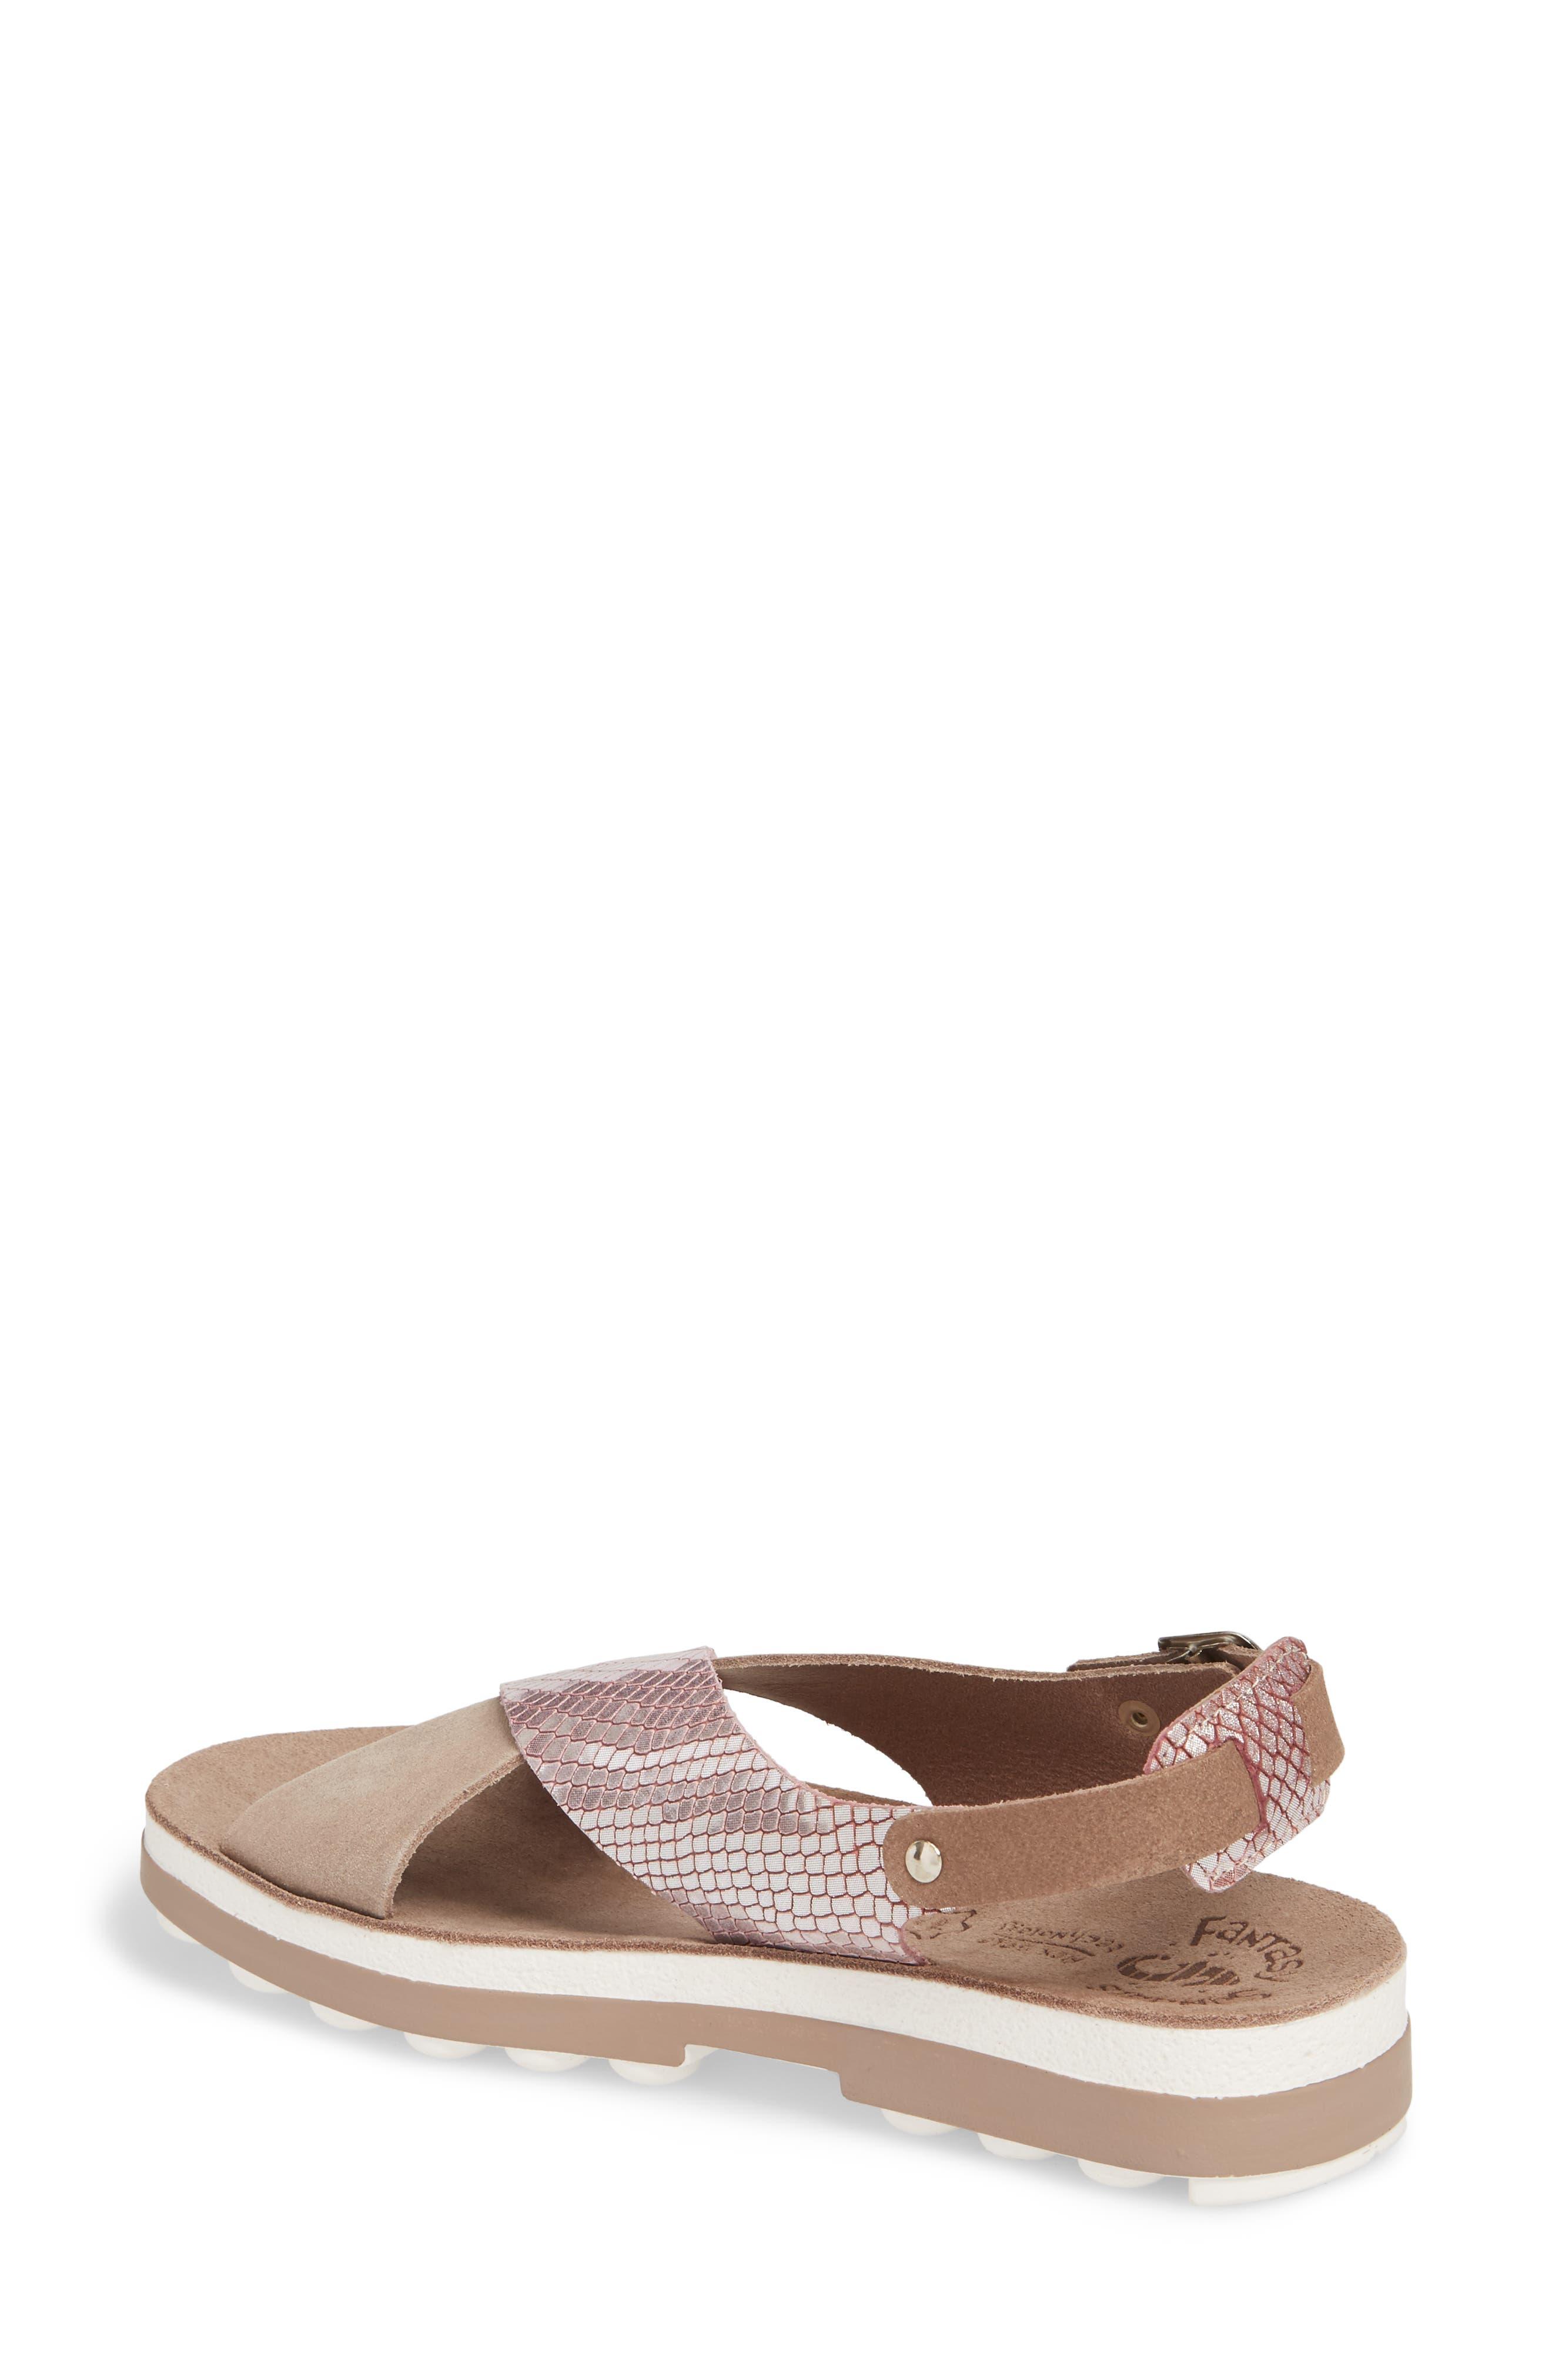 Izabella Fantasy Platform Sandal,                             Alternate thumbnail 2, color,                             Coffee Snake Leather